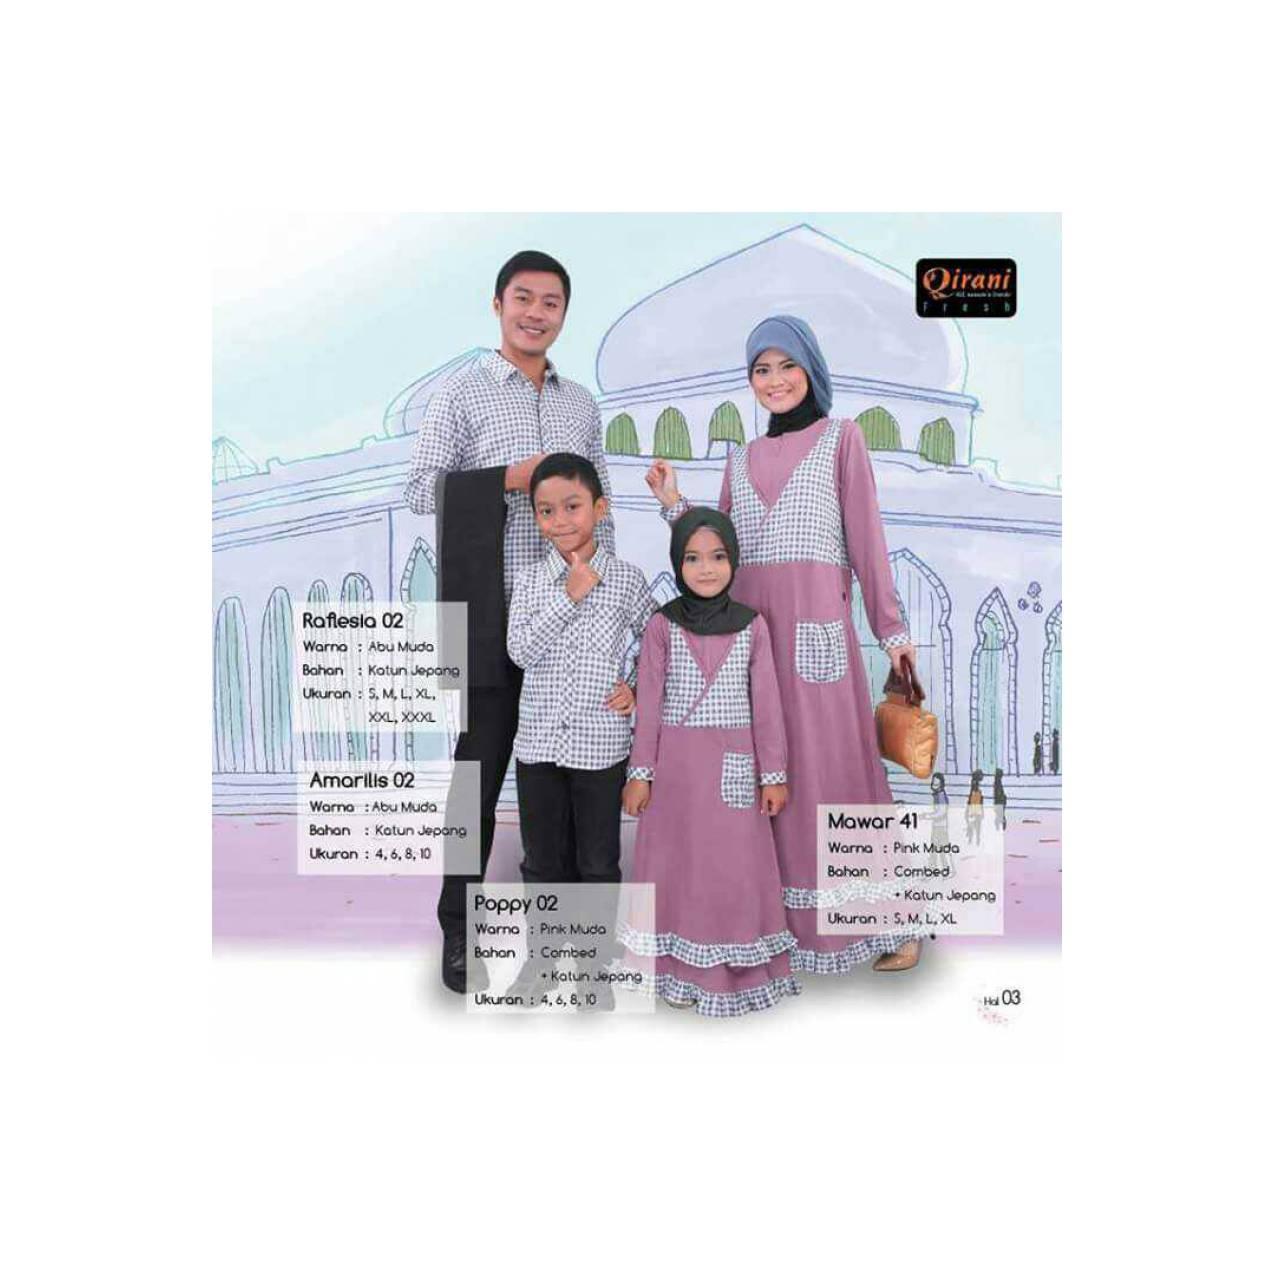 Terbaru - Sarimbit Keluarga Qirani - Gamis Pink muda - Kemeja abu muda